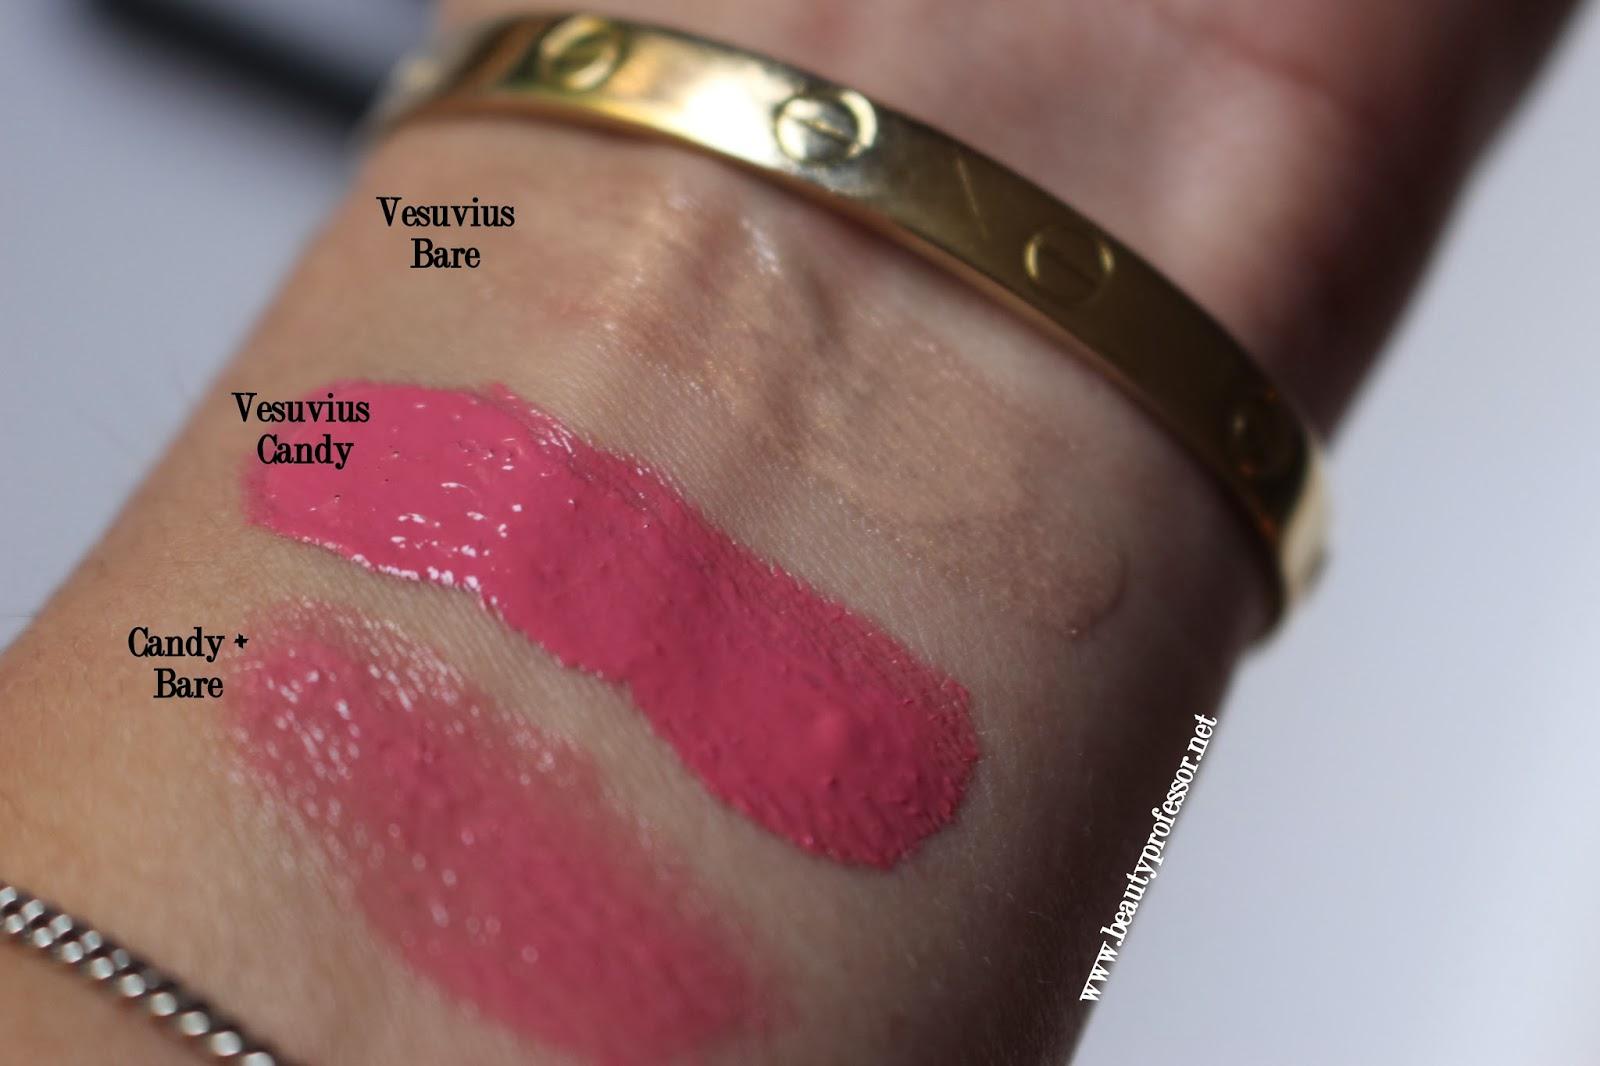 Vesuvius Liquid Lipstick by Lipstick Queen #6